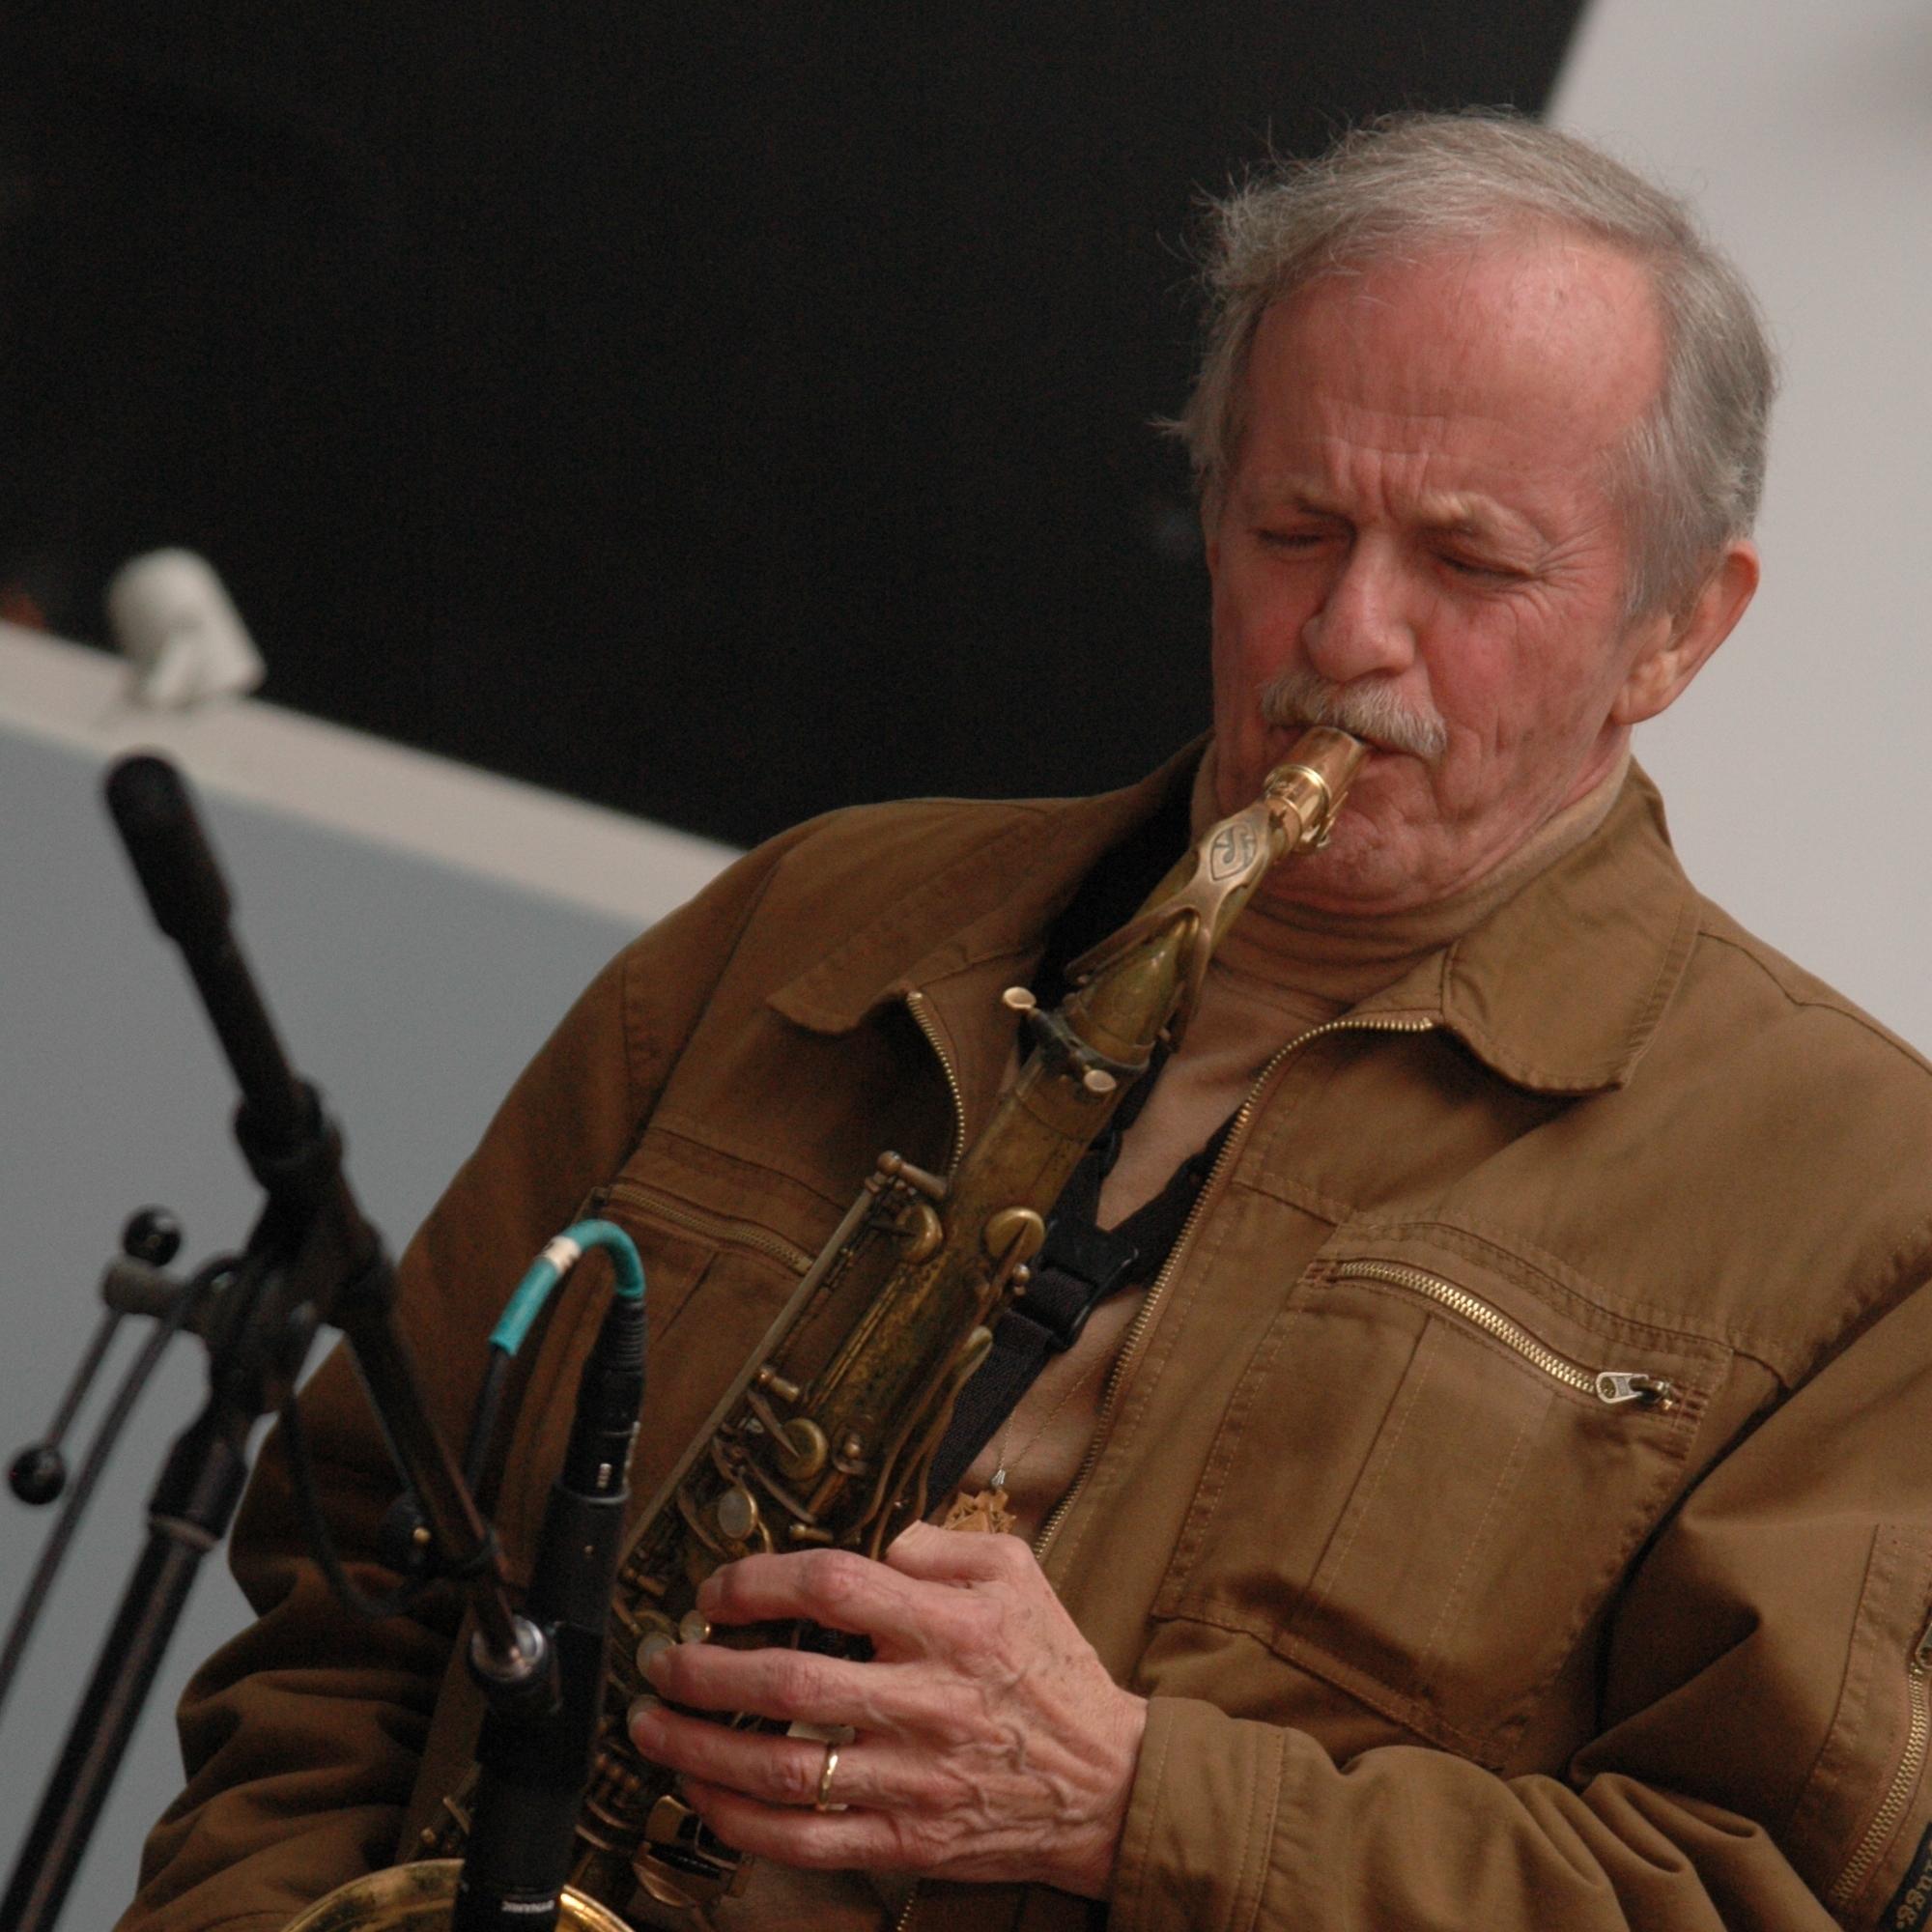 Jerry Coker, 2009